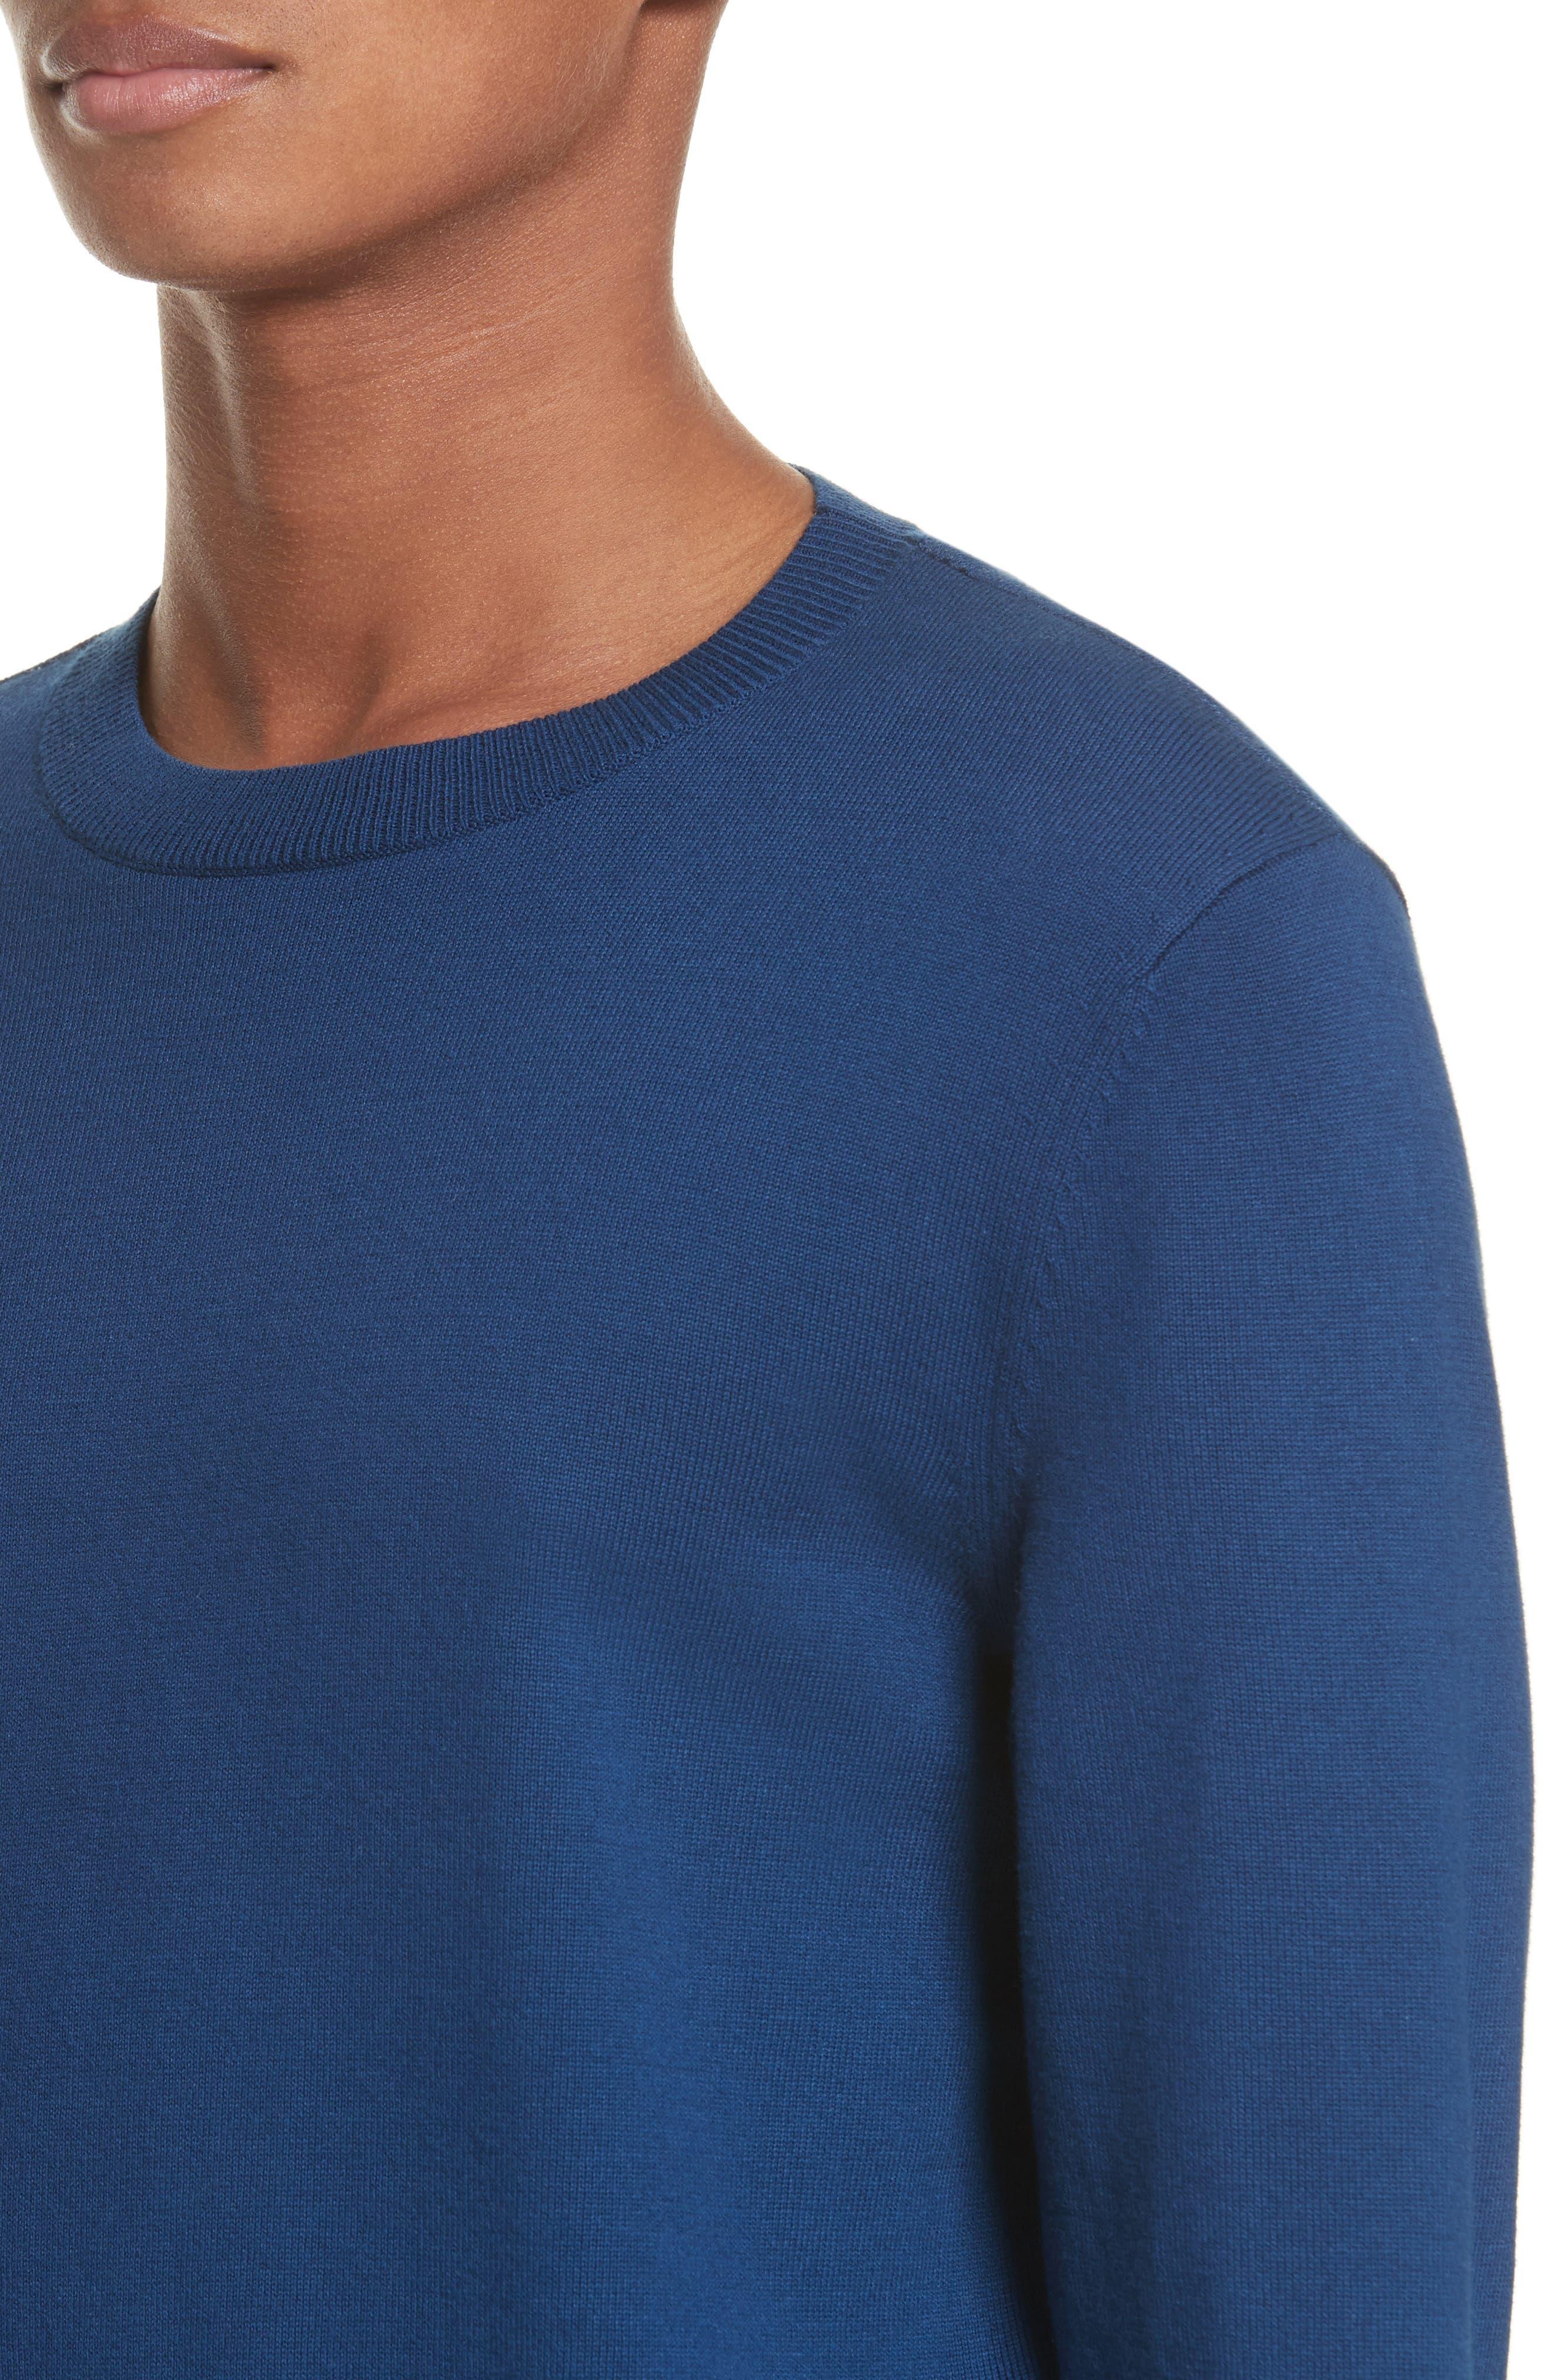 CIA Crewneck Sweater,                             Alternate thumbnail 4, color,                             Bleu Fonce Iah